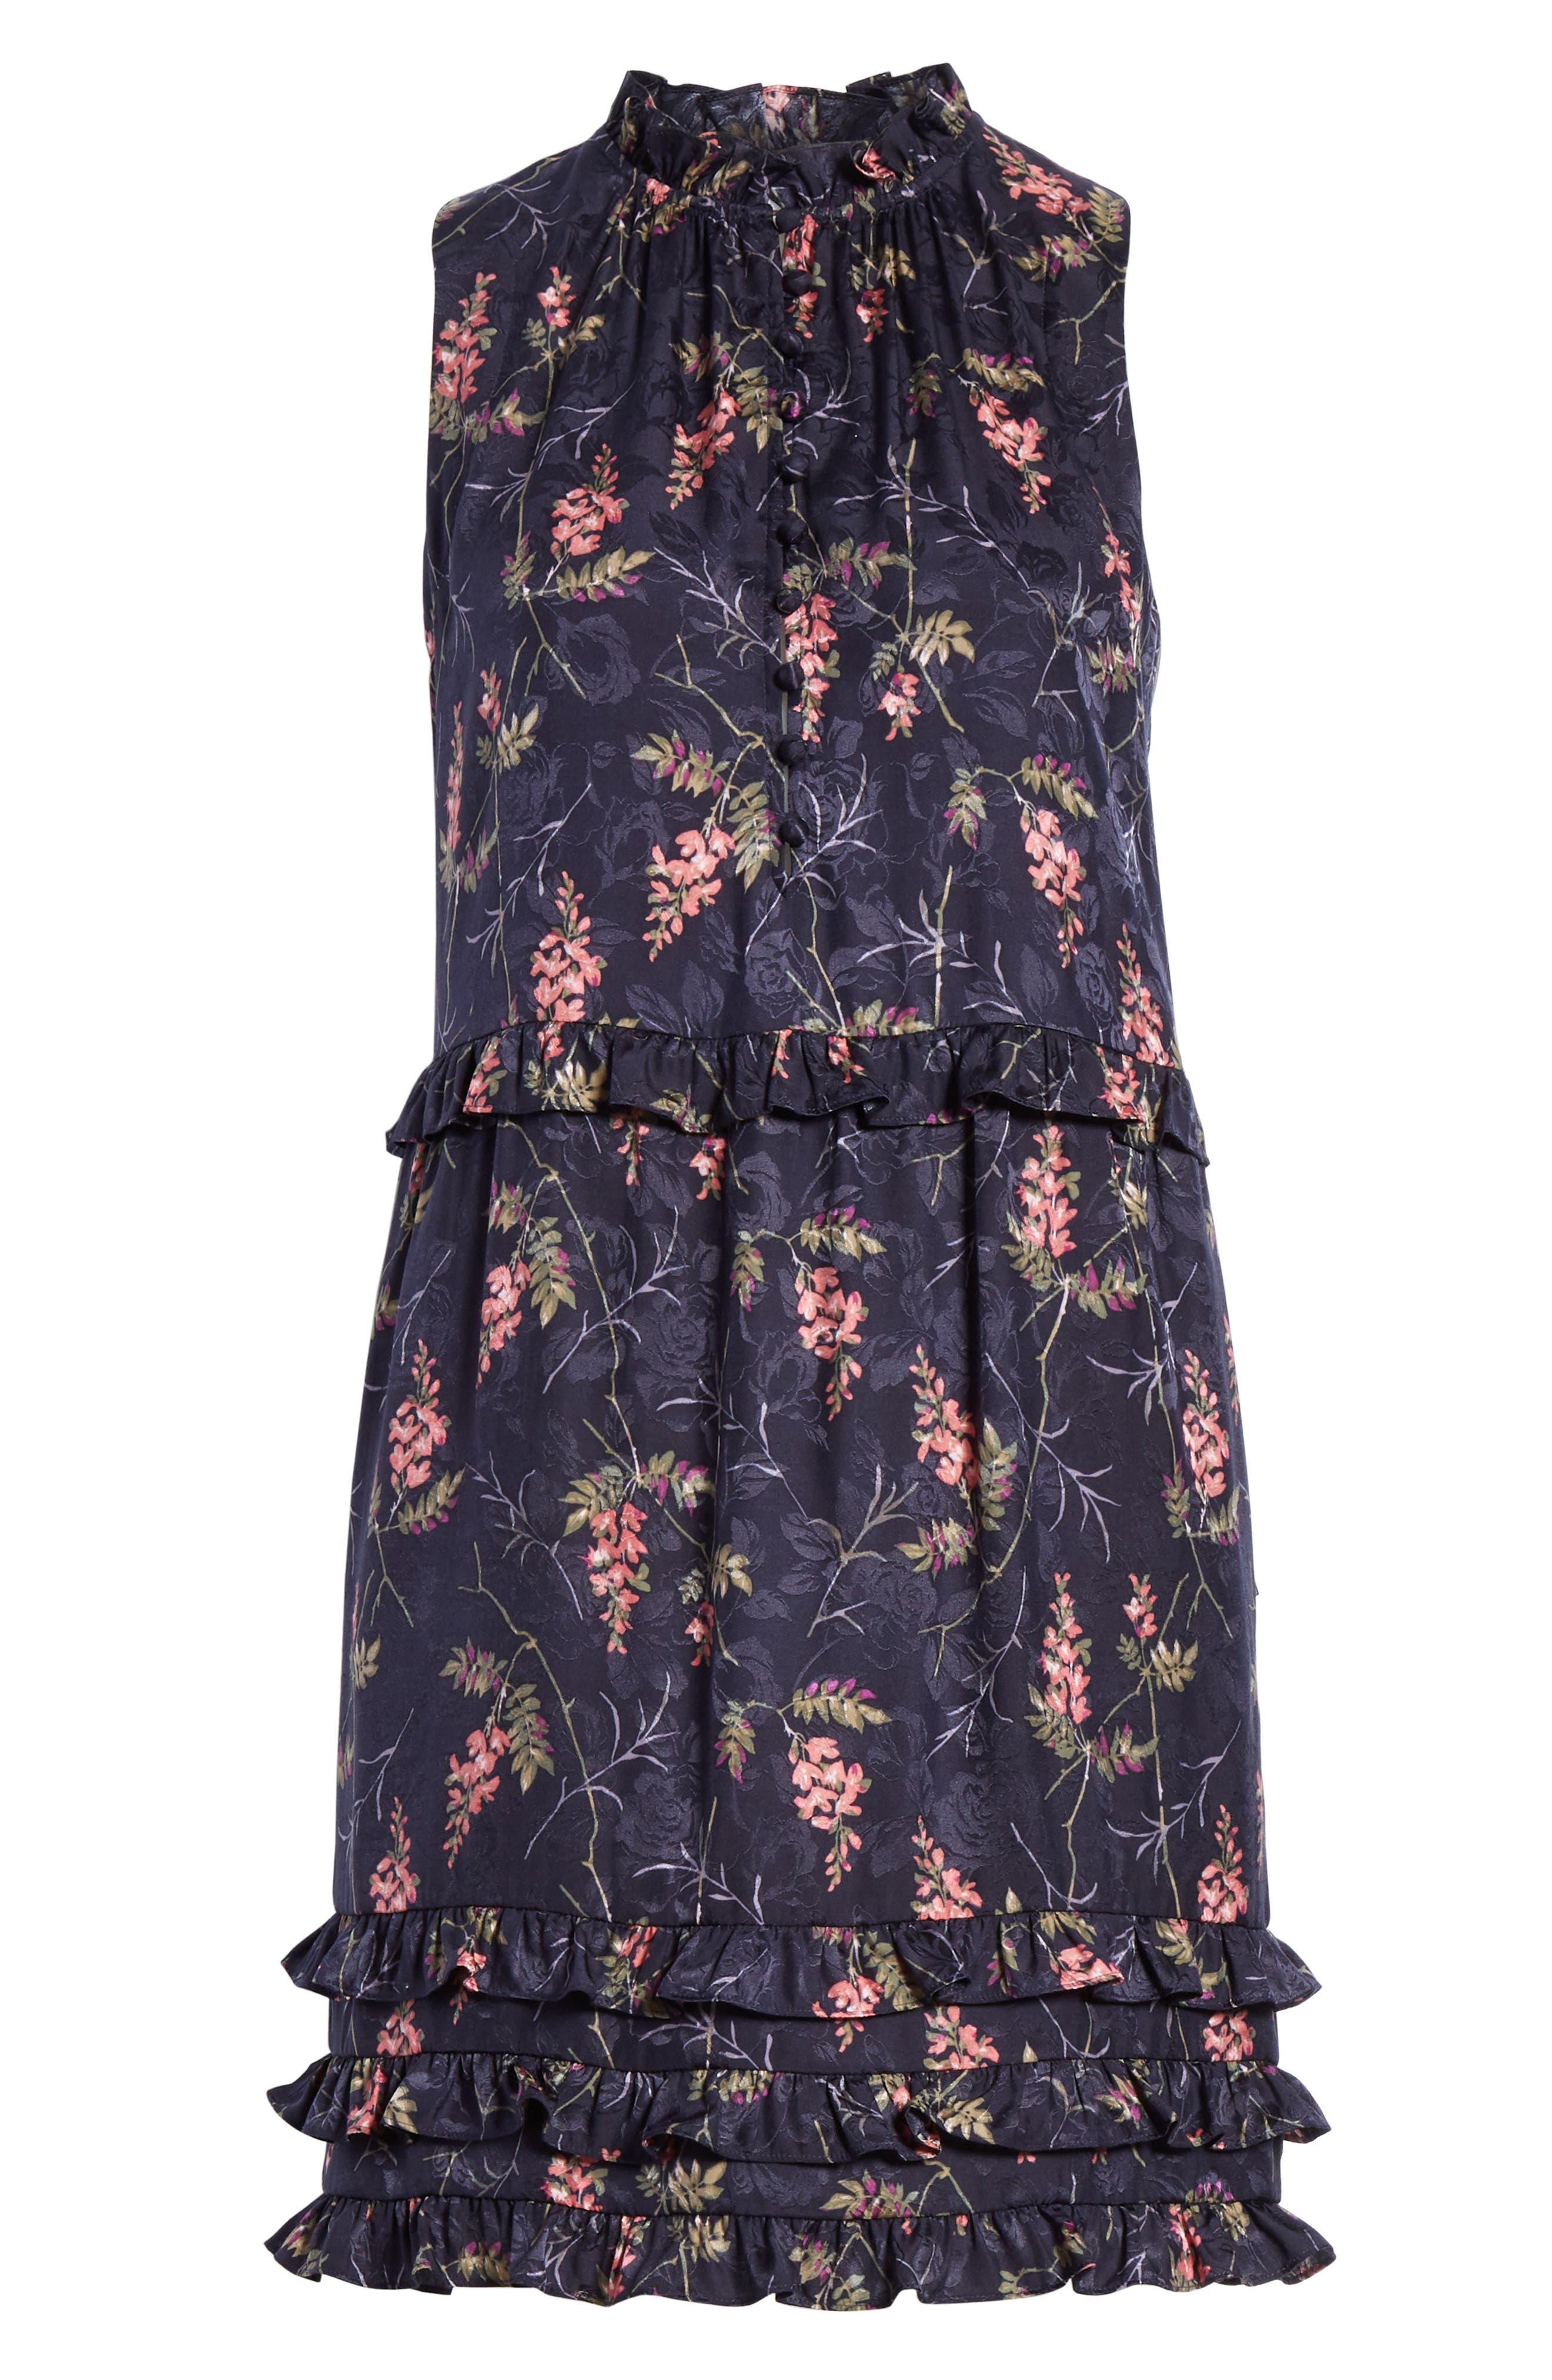 REBECCA TAYLOR, Ivie Floral Ruffle Silk Blend Dress, Alternate thumbnail 6, color, NAVY COMBO